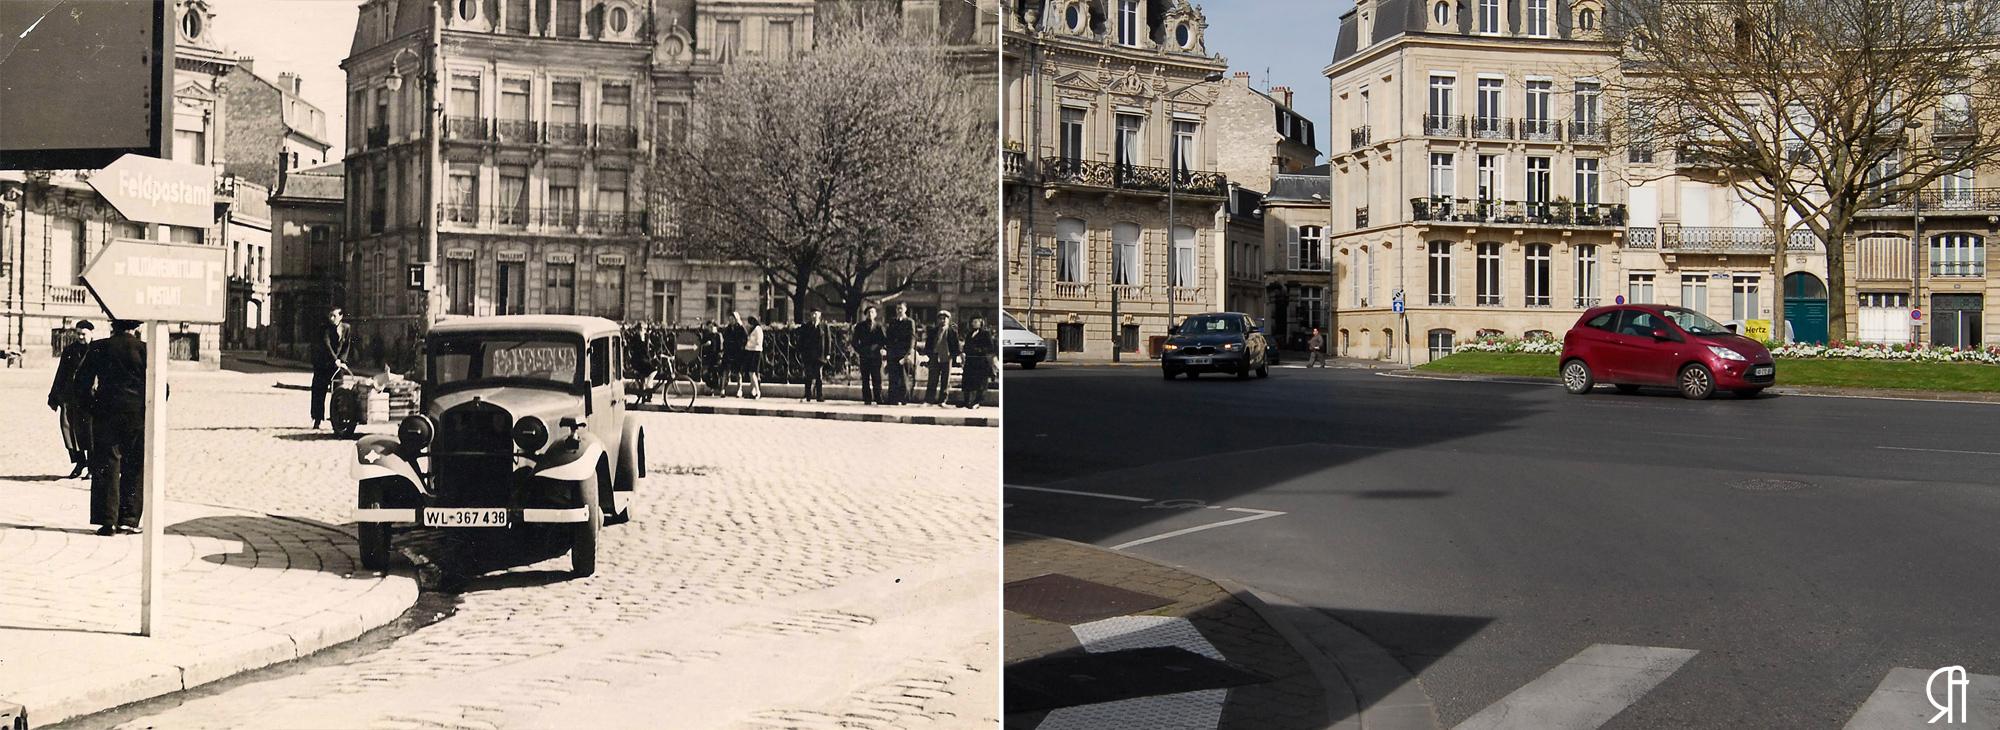 La place Aristide Briand en 1940